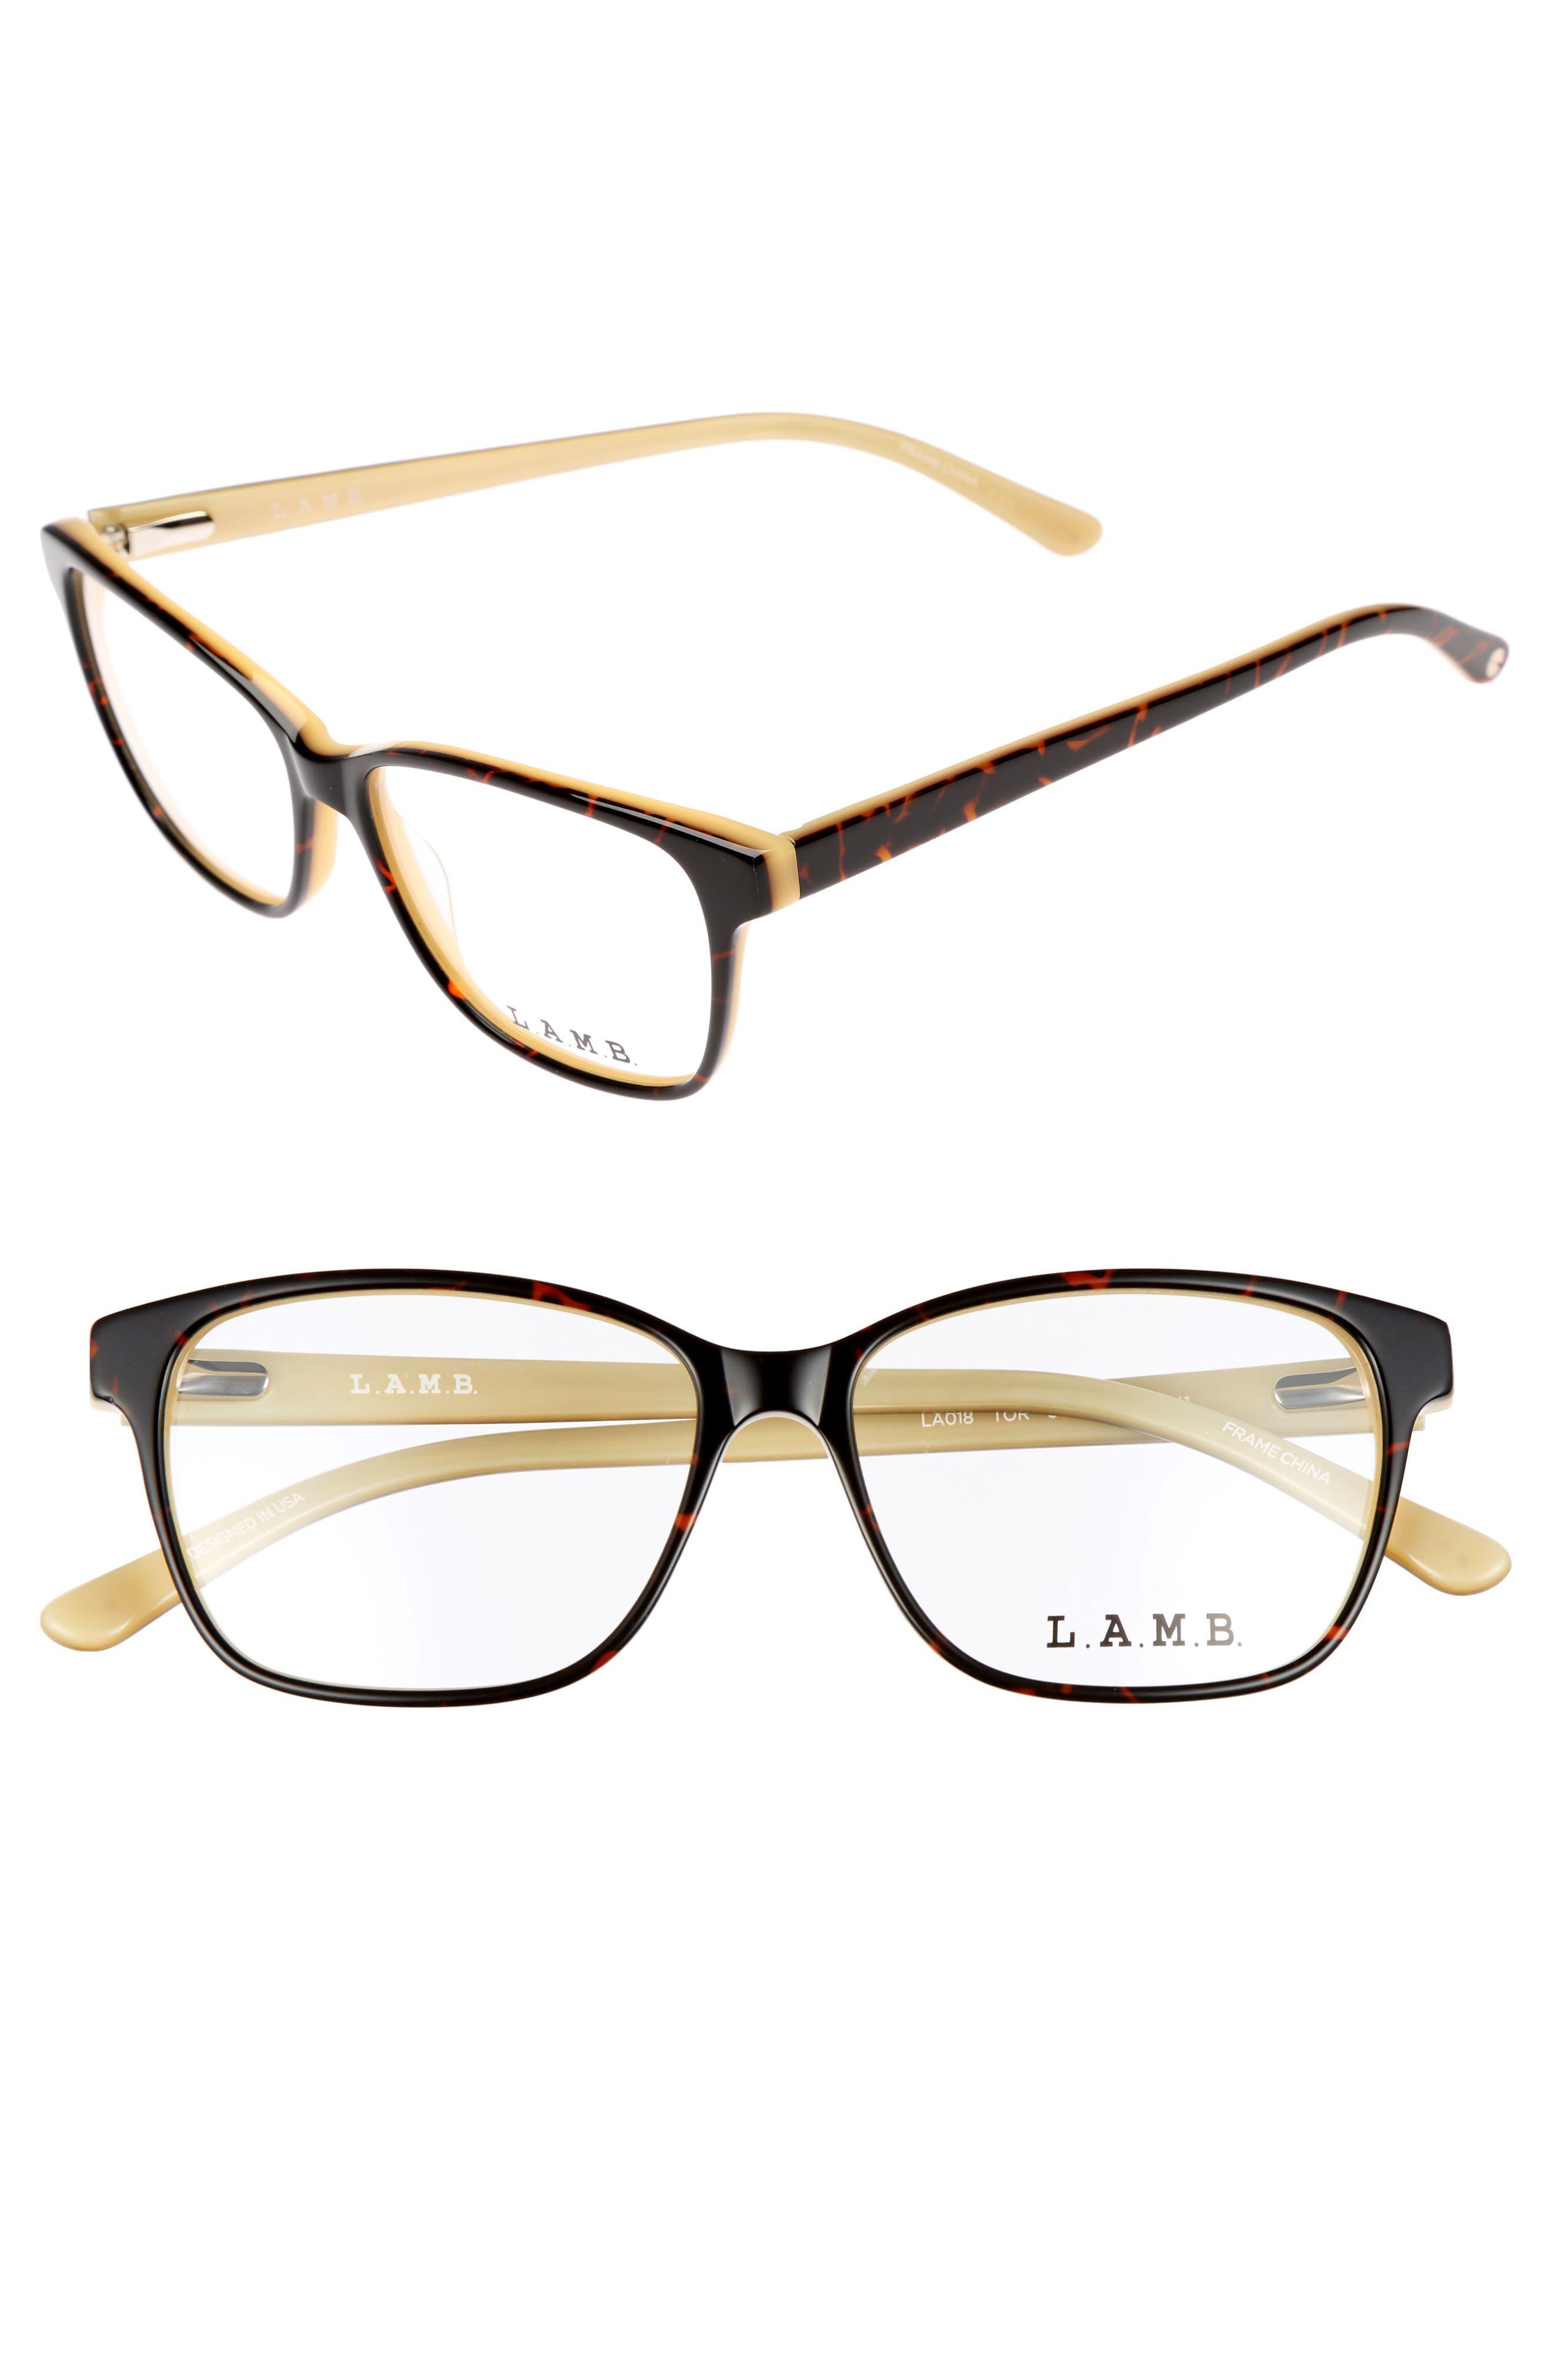 54mm Square Optical Glasses,                             Main thumbnail 1, color,                             Yellow